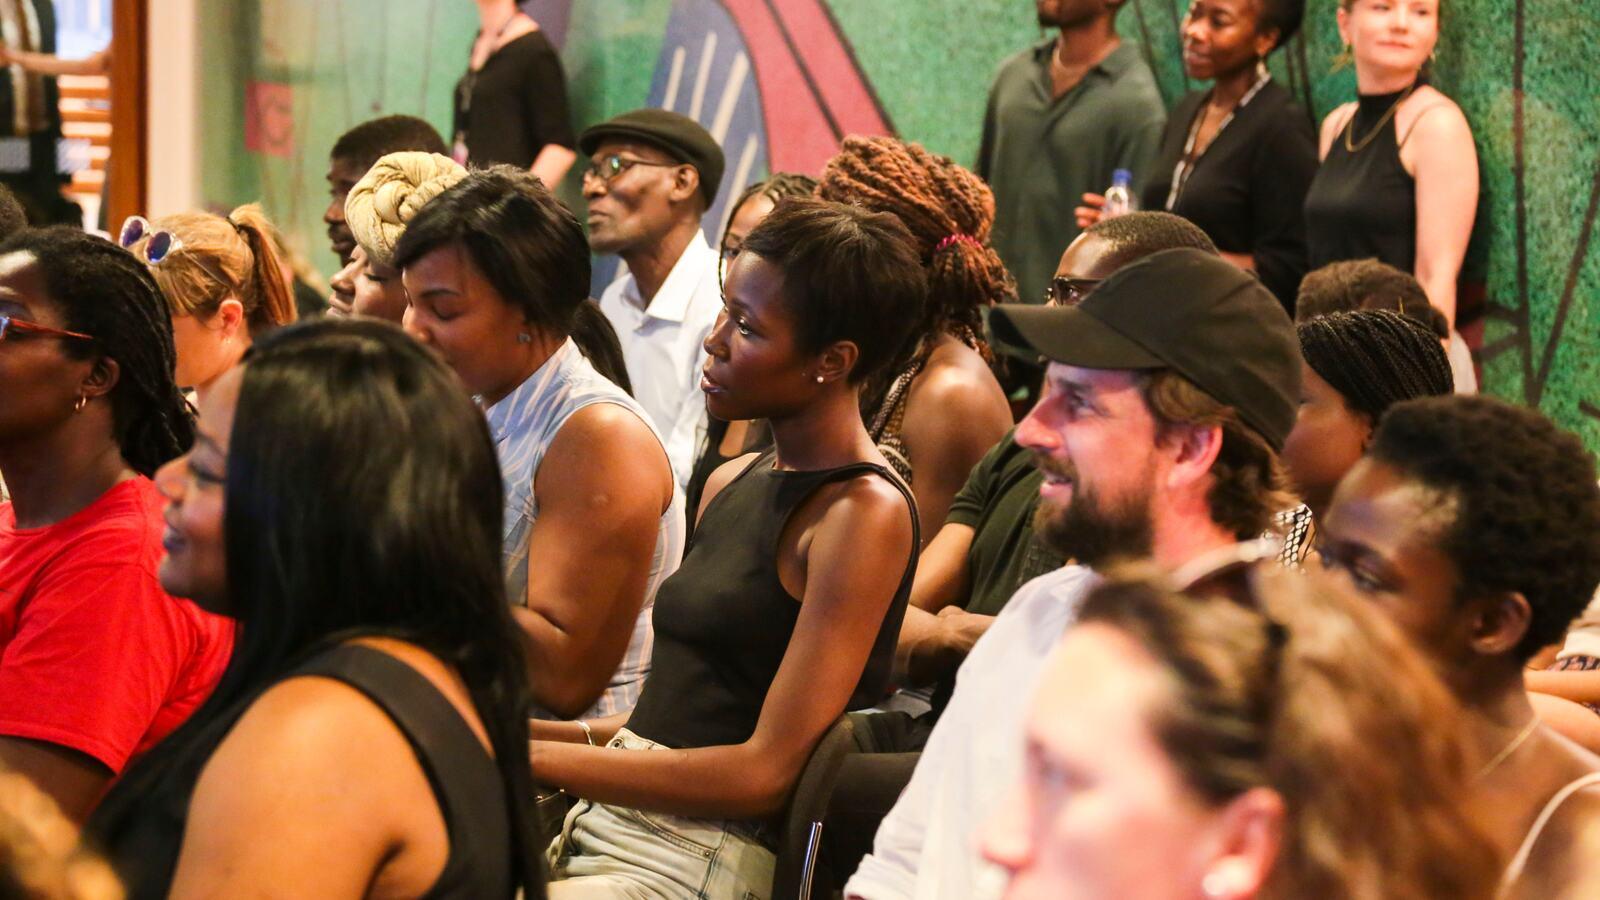 Naatal Presents Africa Utopia Member's Salon 2016.26th August 2016.